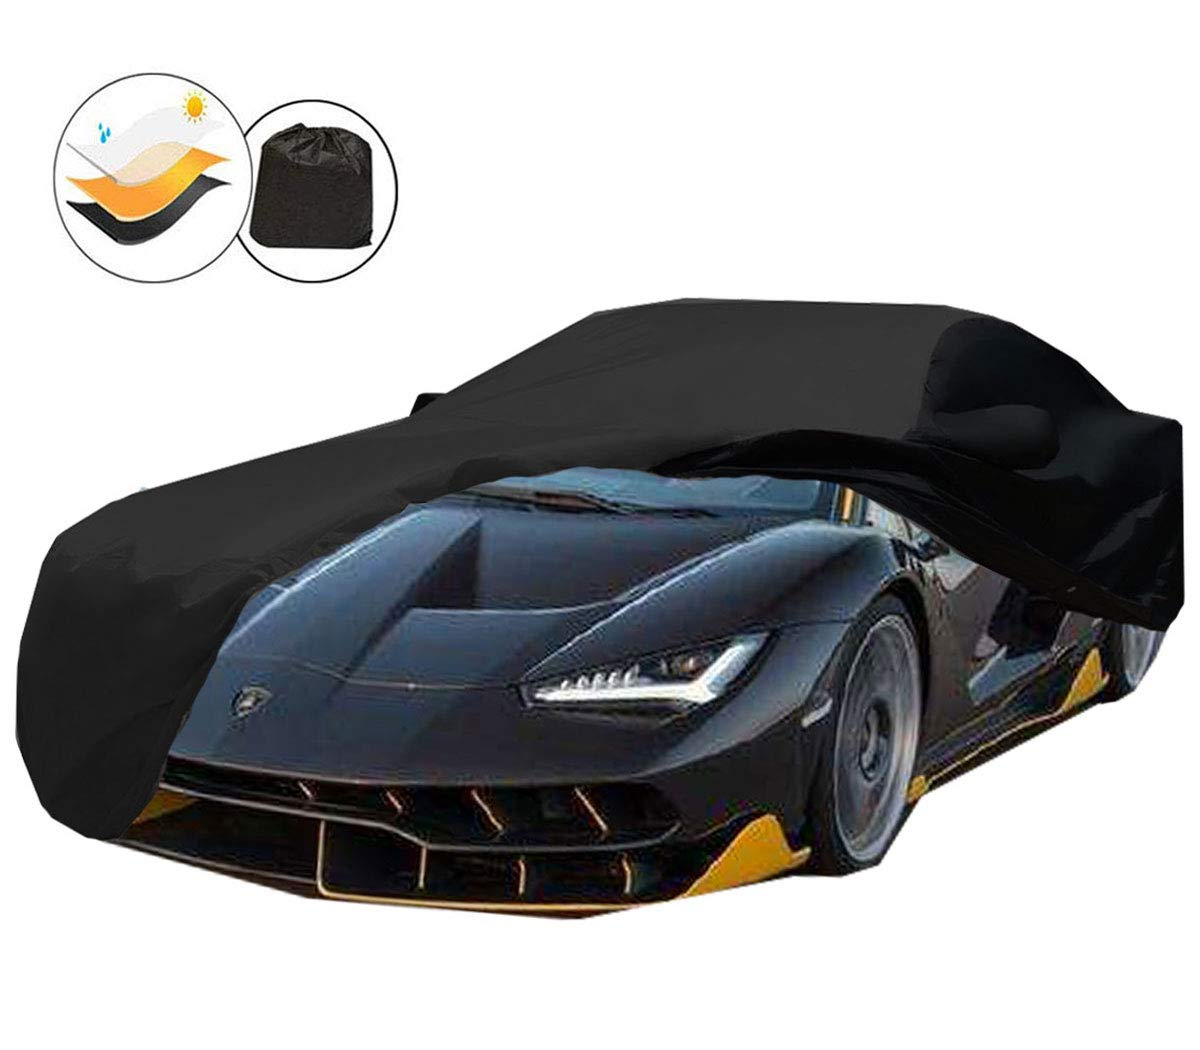 Durable Convertible Black Covers for Indoor Garage Storage iiSPORT Water Resistant Car Cover Custom Fit C6 2005-2013 Corvette Grand Sport